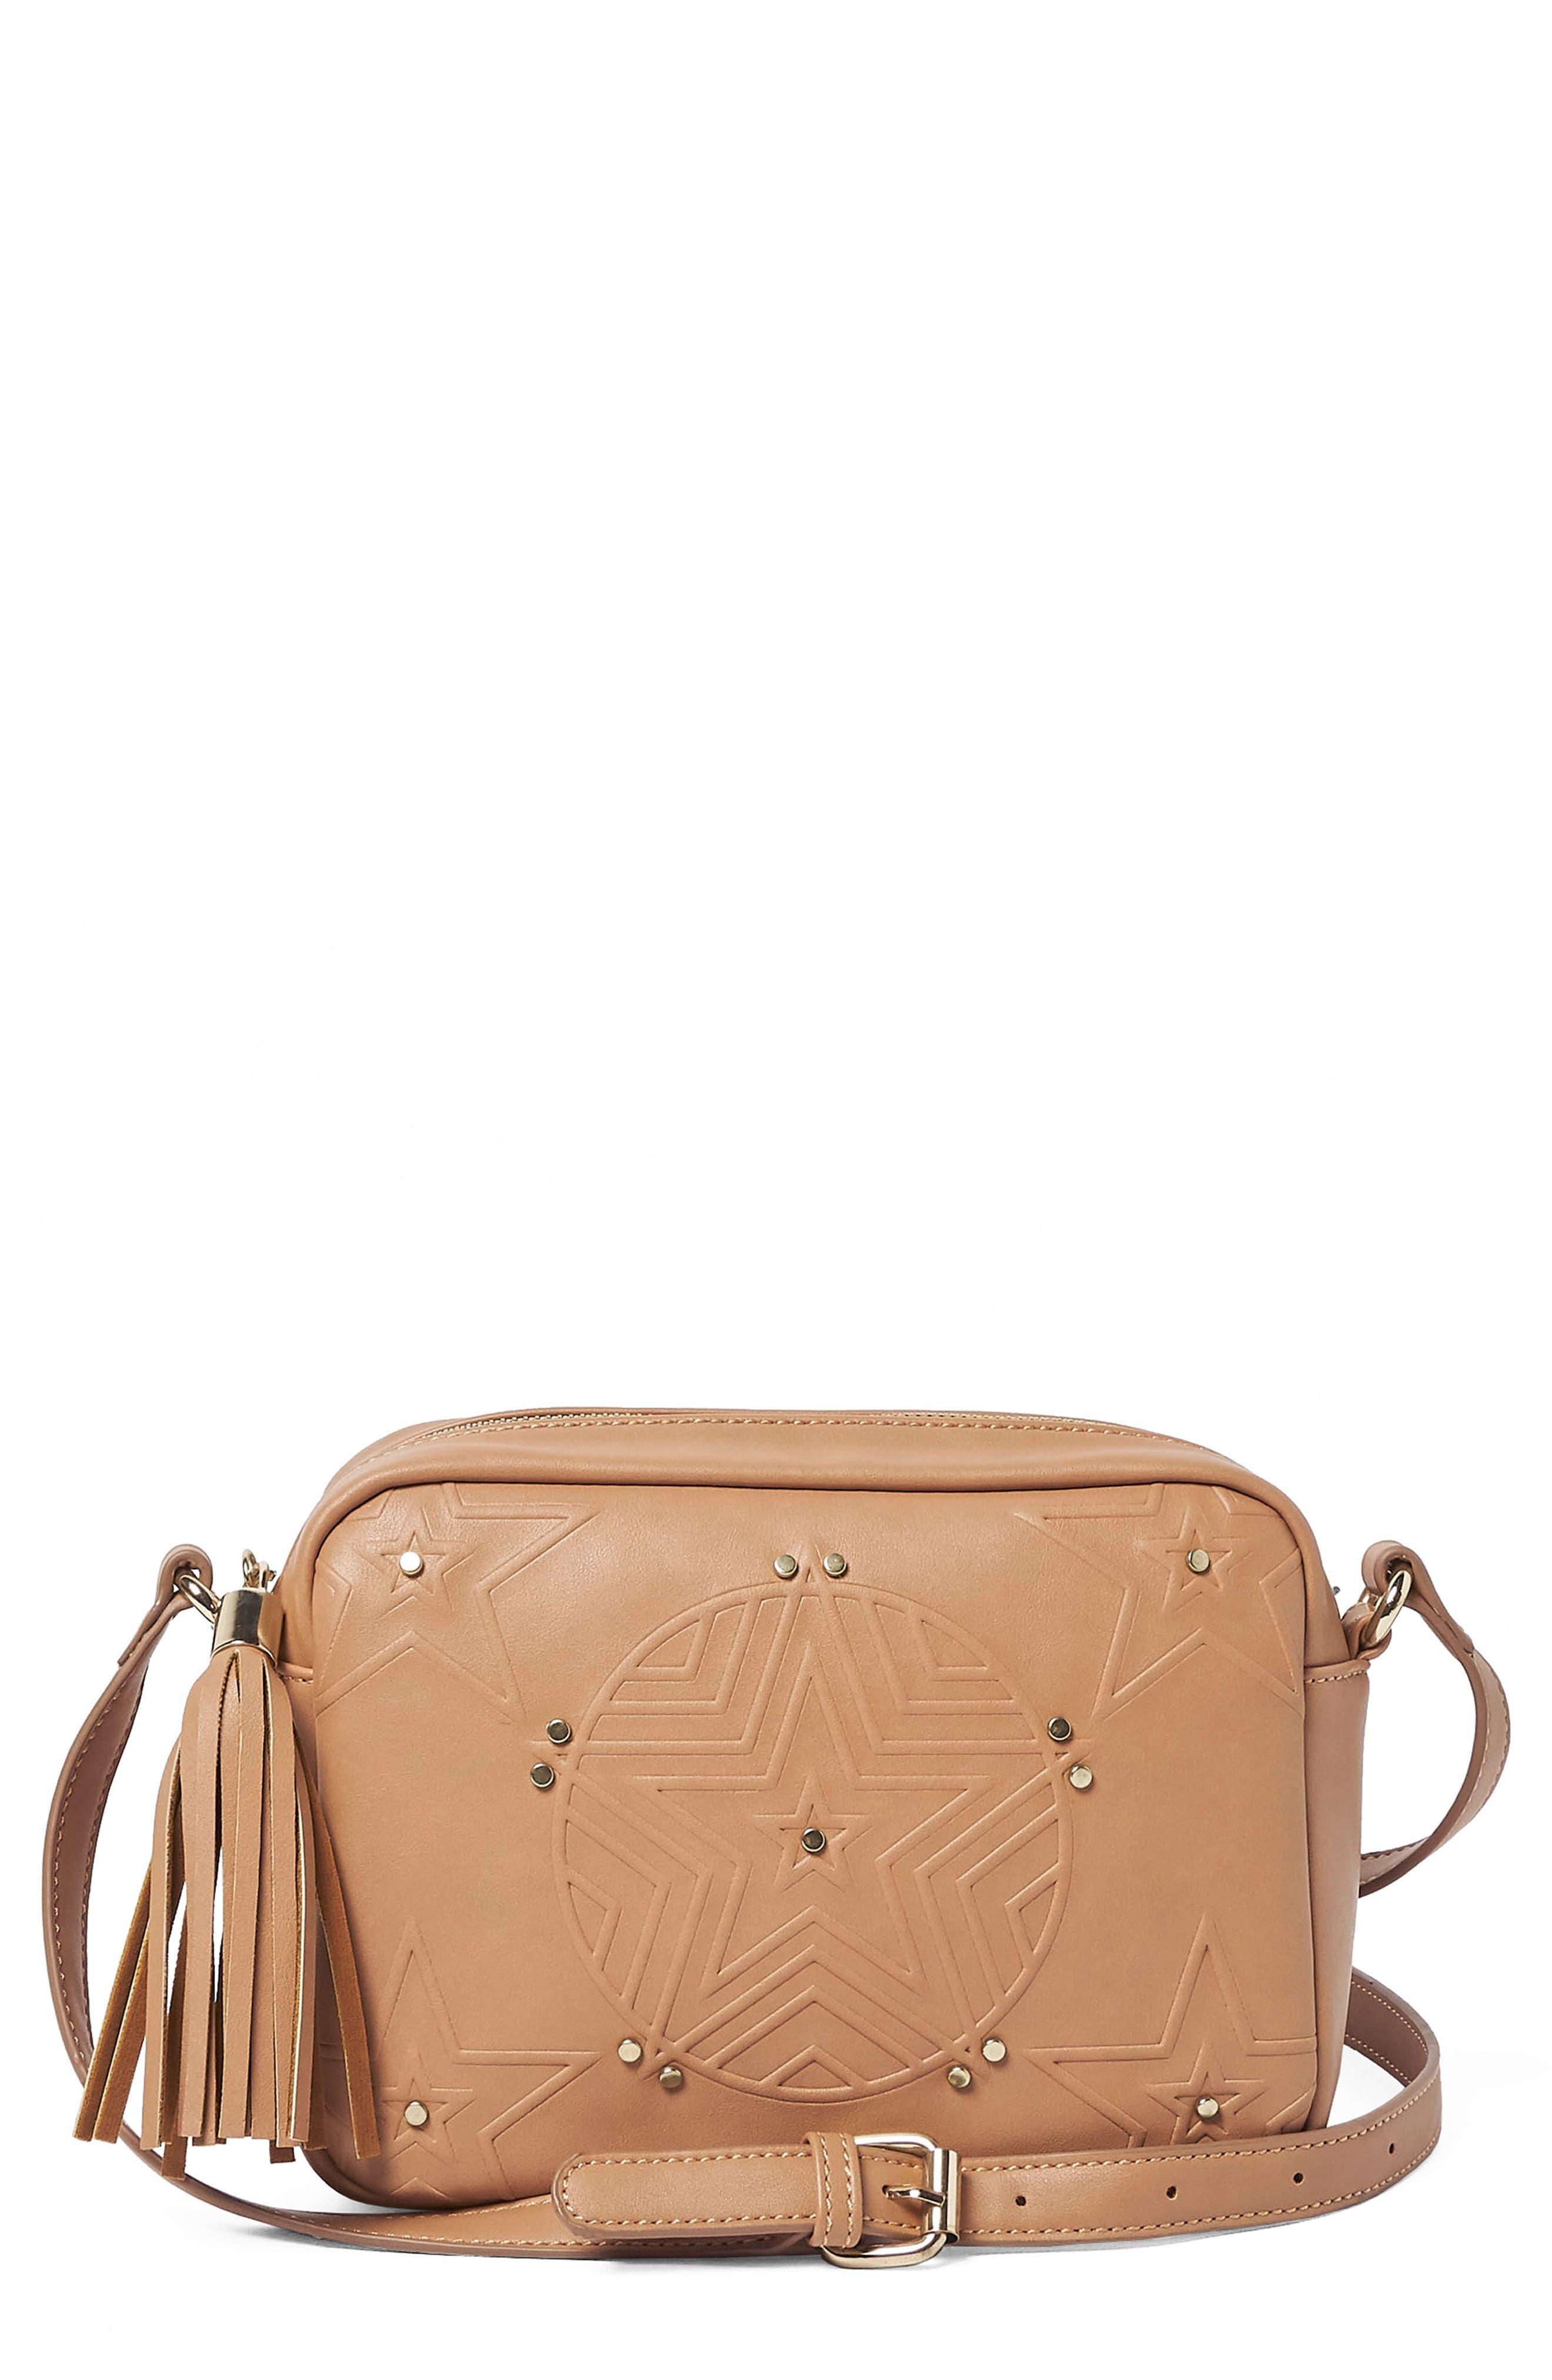 Stargazer Vegan Leather Crossbody Bag,                             Main thumbnail 3, color,